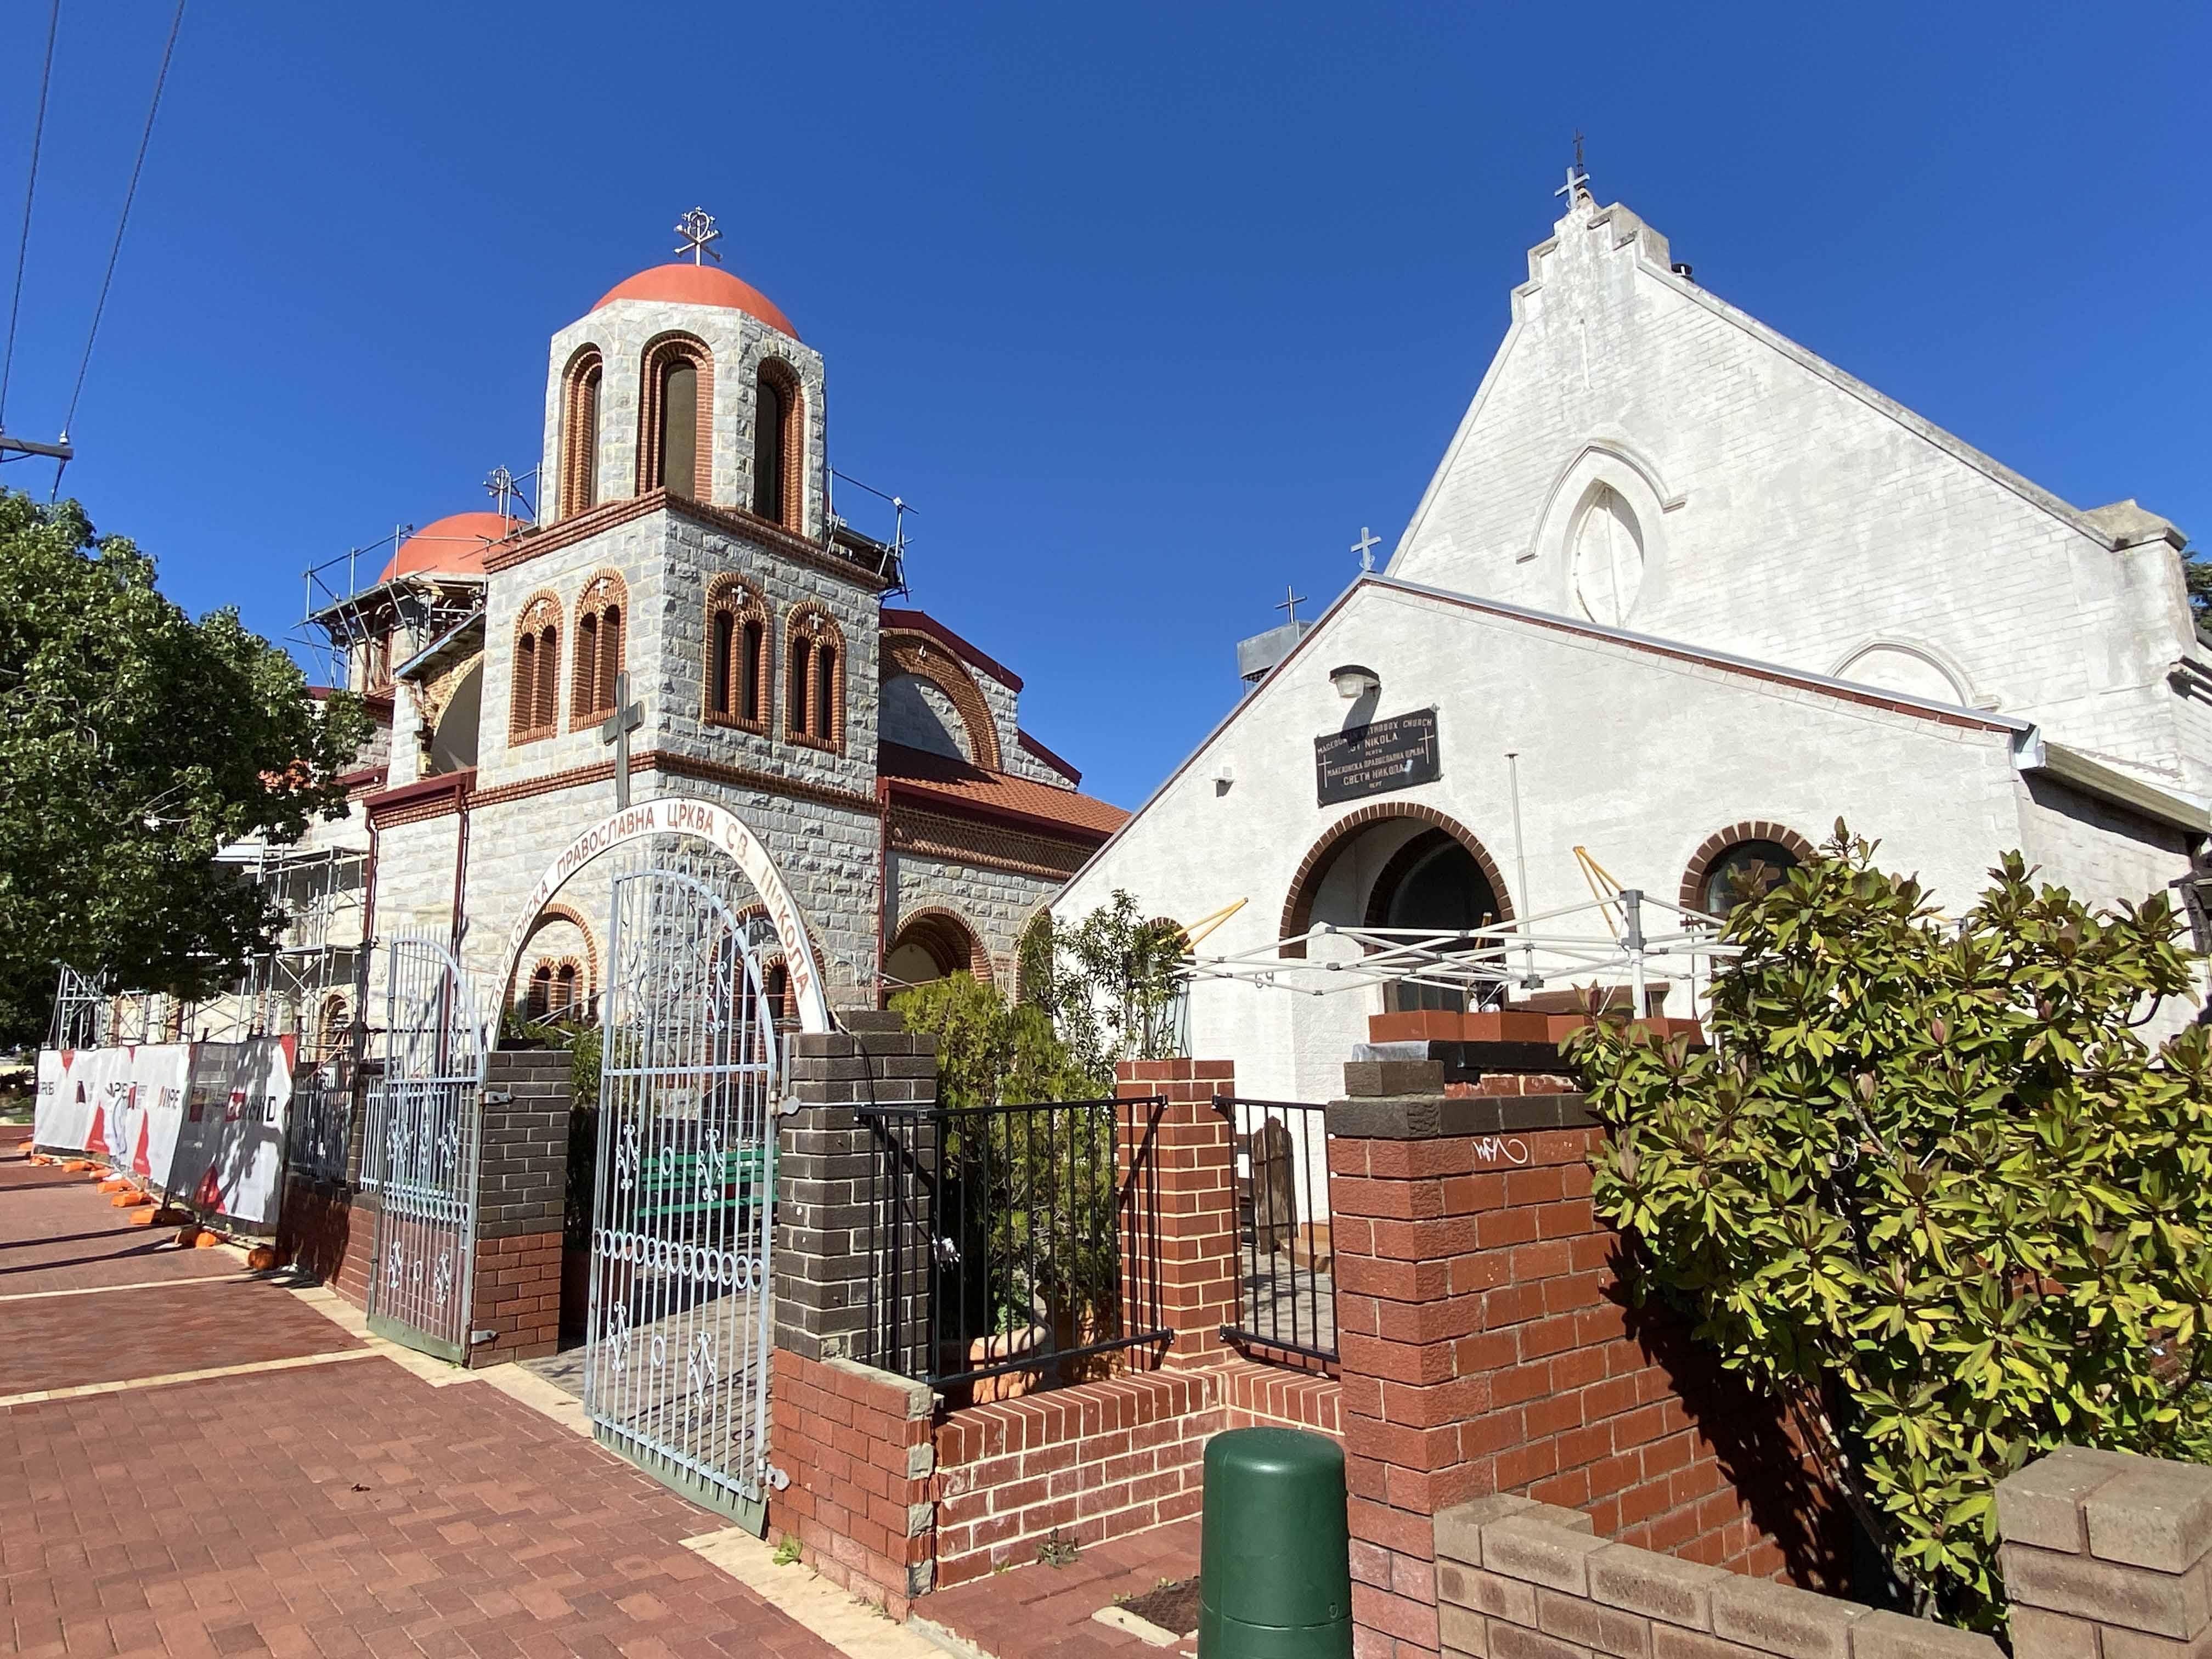 50. St Nikolas North Perth, 2020